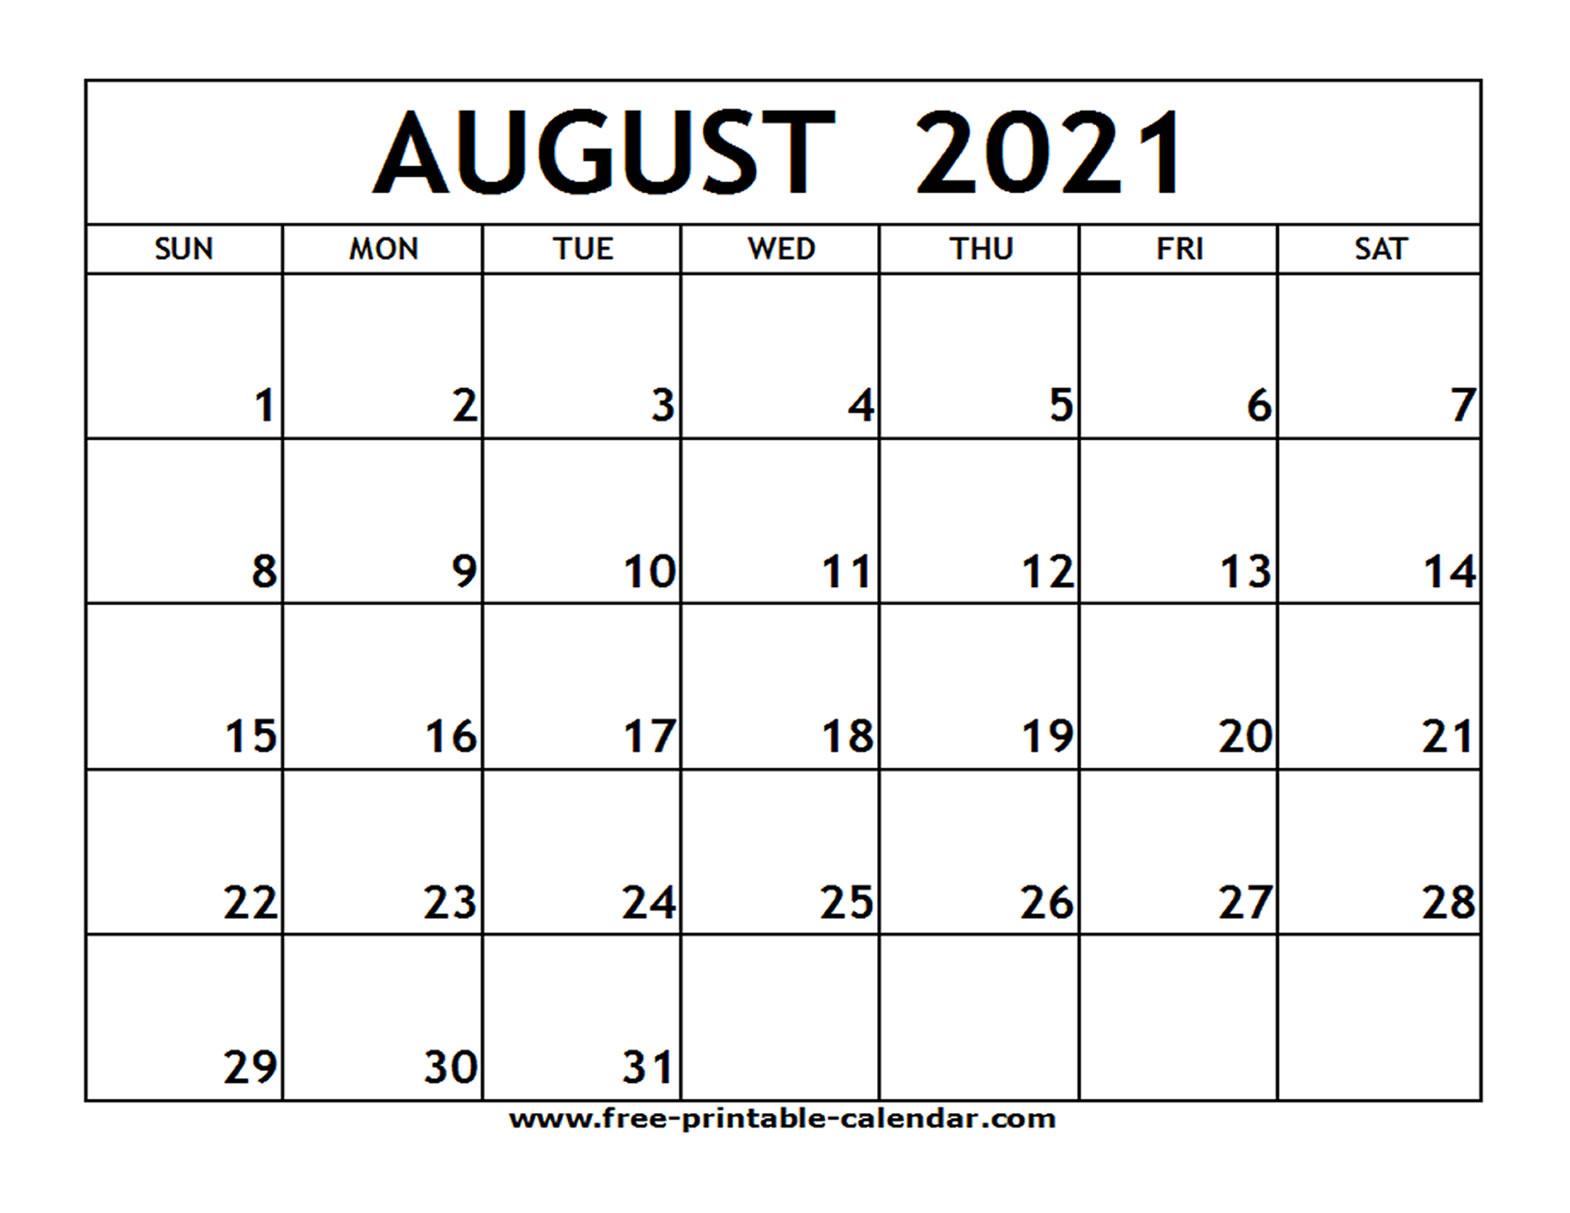 Printable Monthly Calendar August 2021 | Free 2021 Printable Calendars